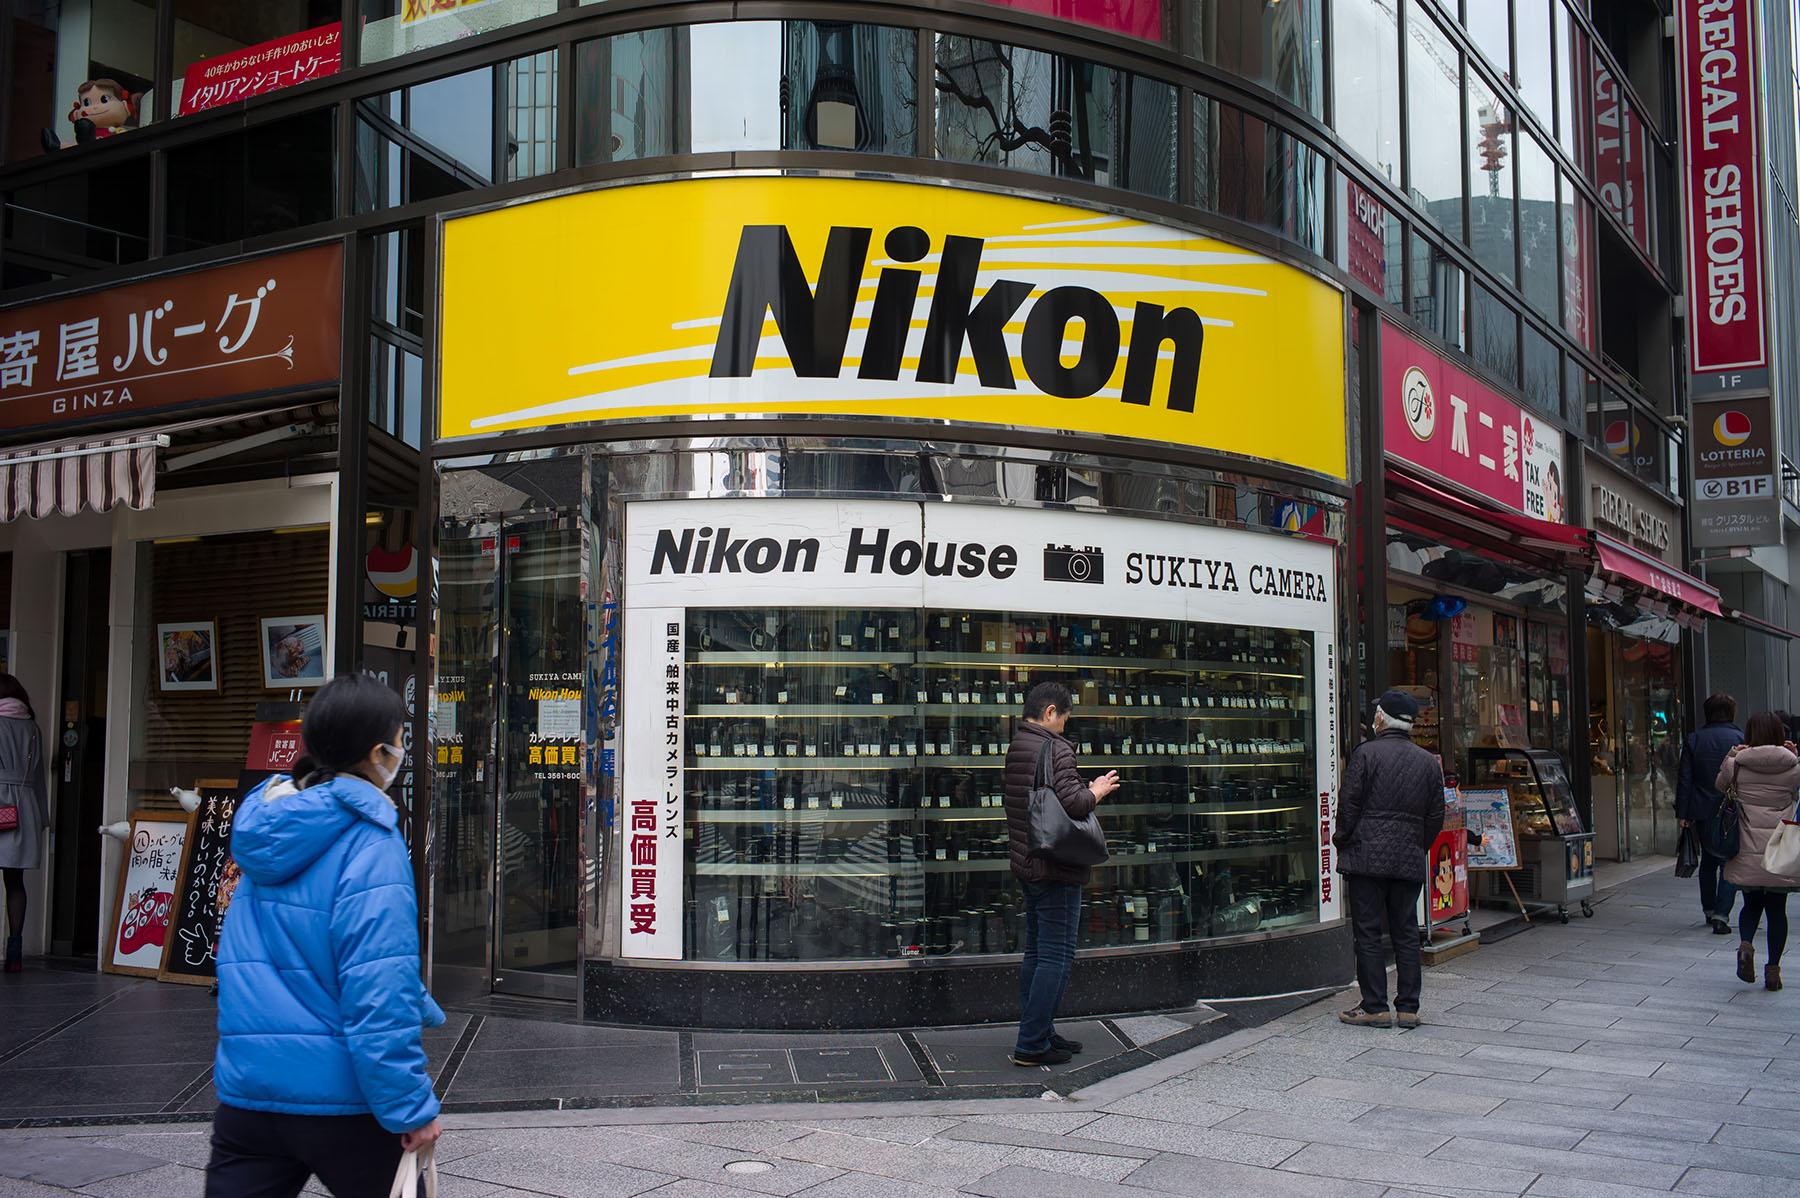 Nikon Houseへ〜今井氏との出会い〜_c0028861_21383519.jpg